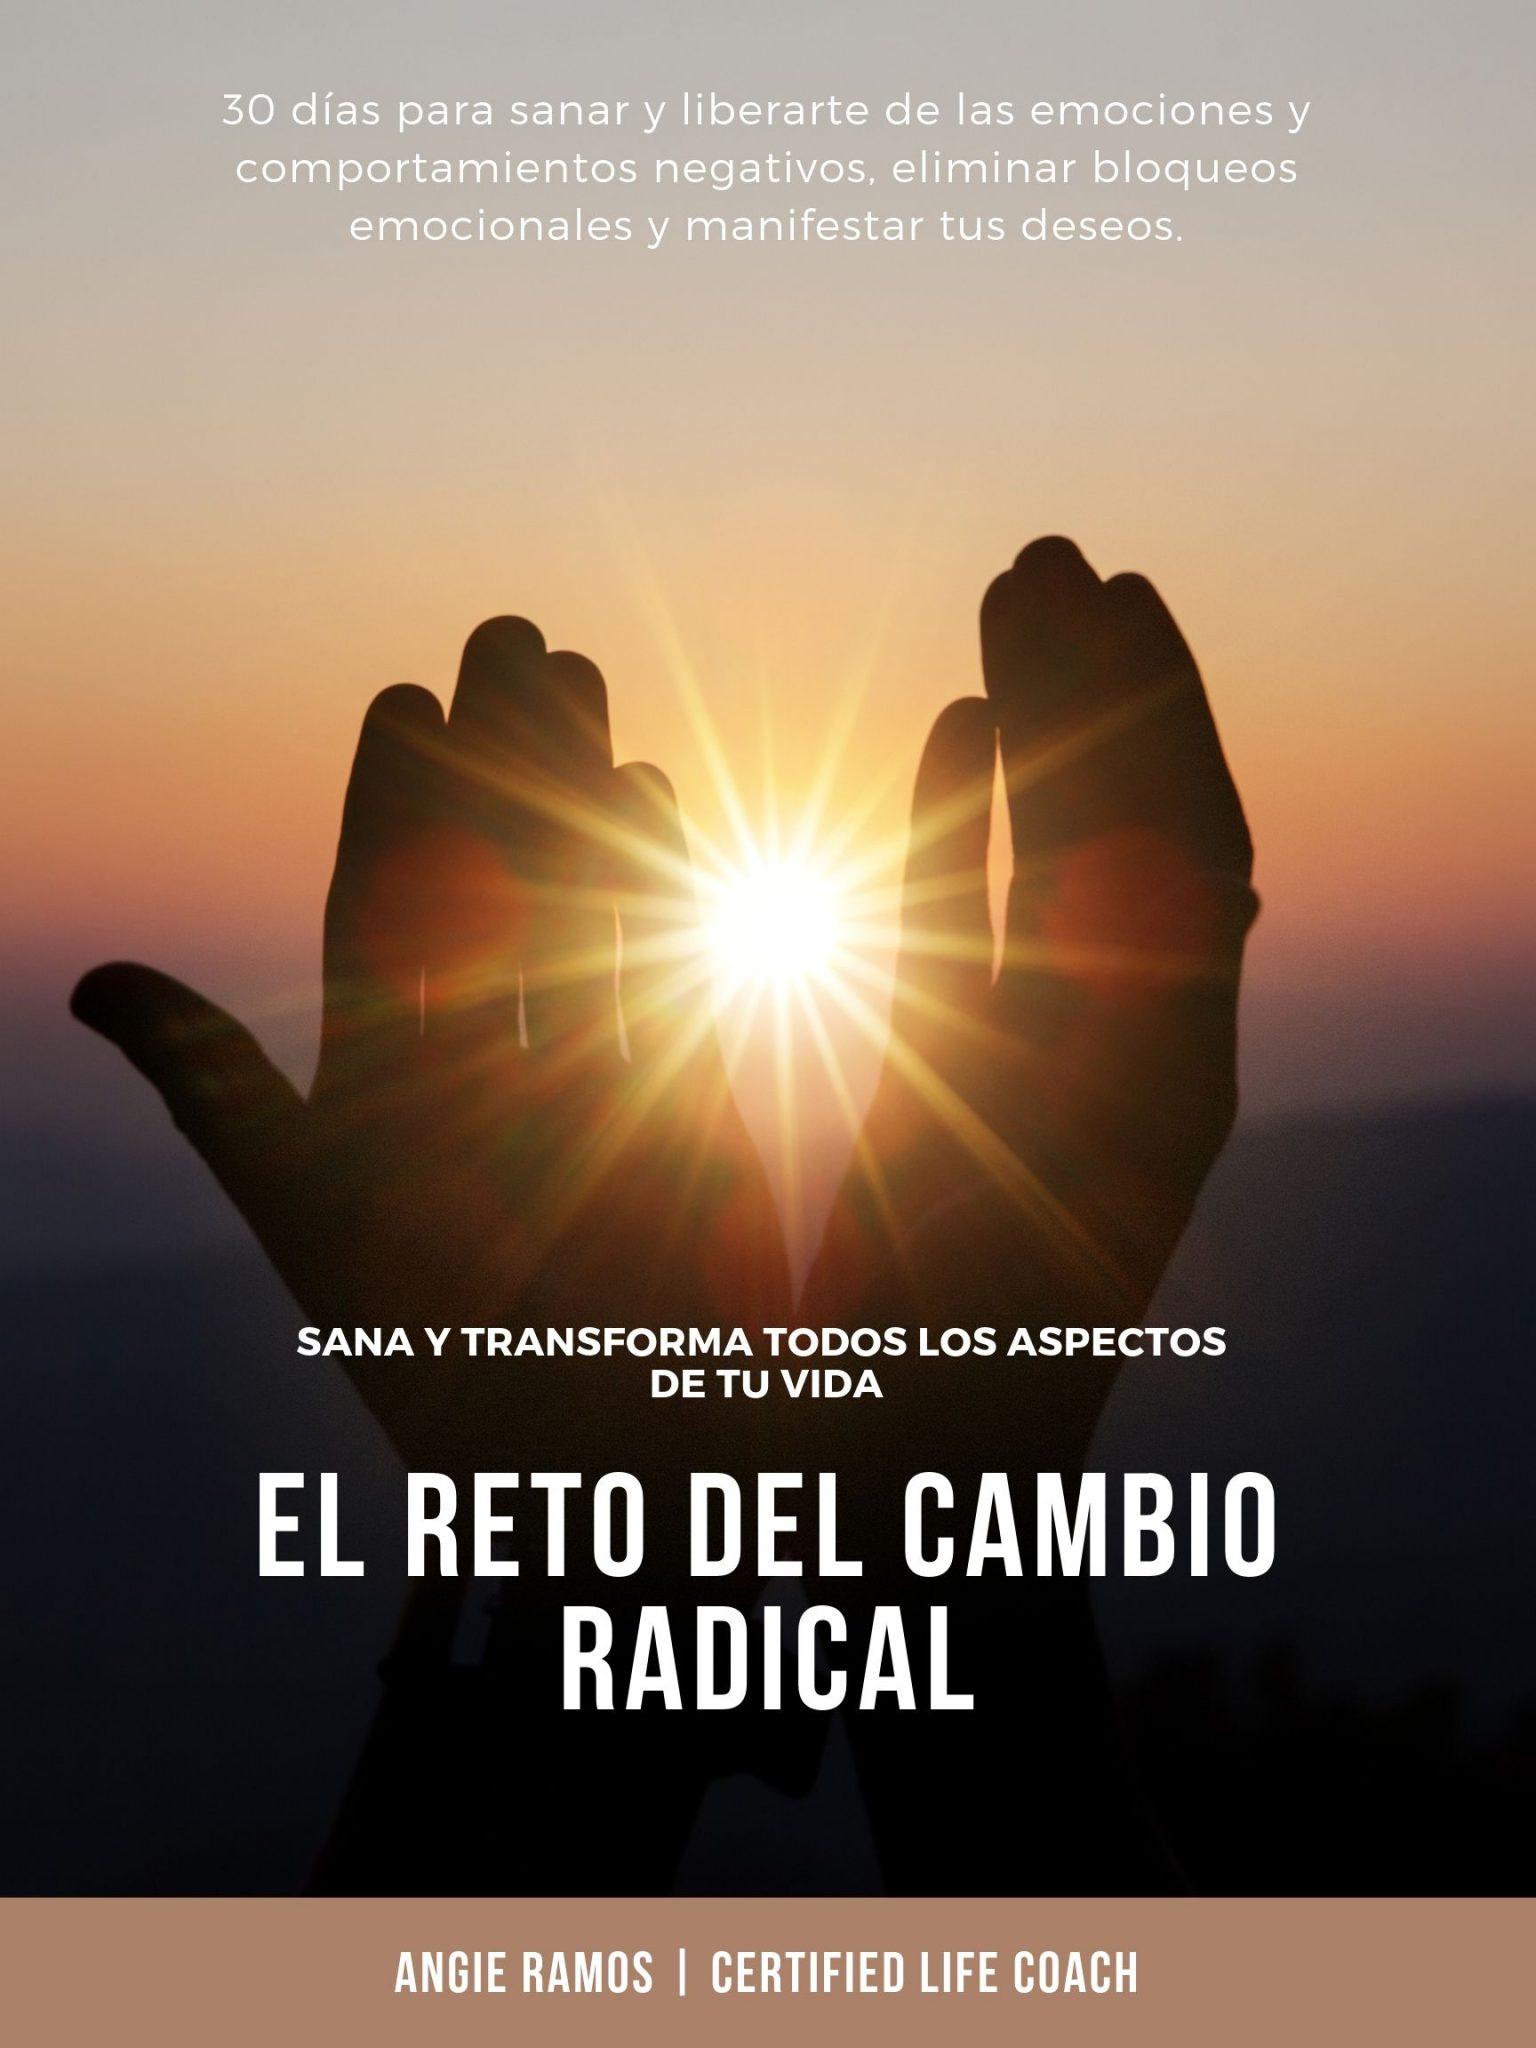 Guía del Cambio Radical - Angie Ramos - Life Coaching